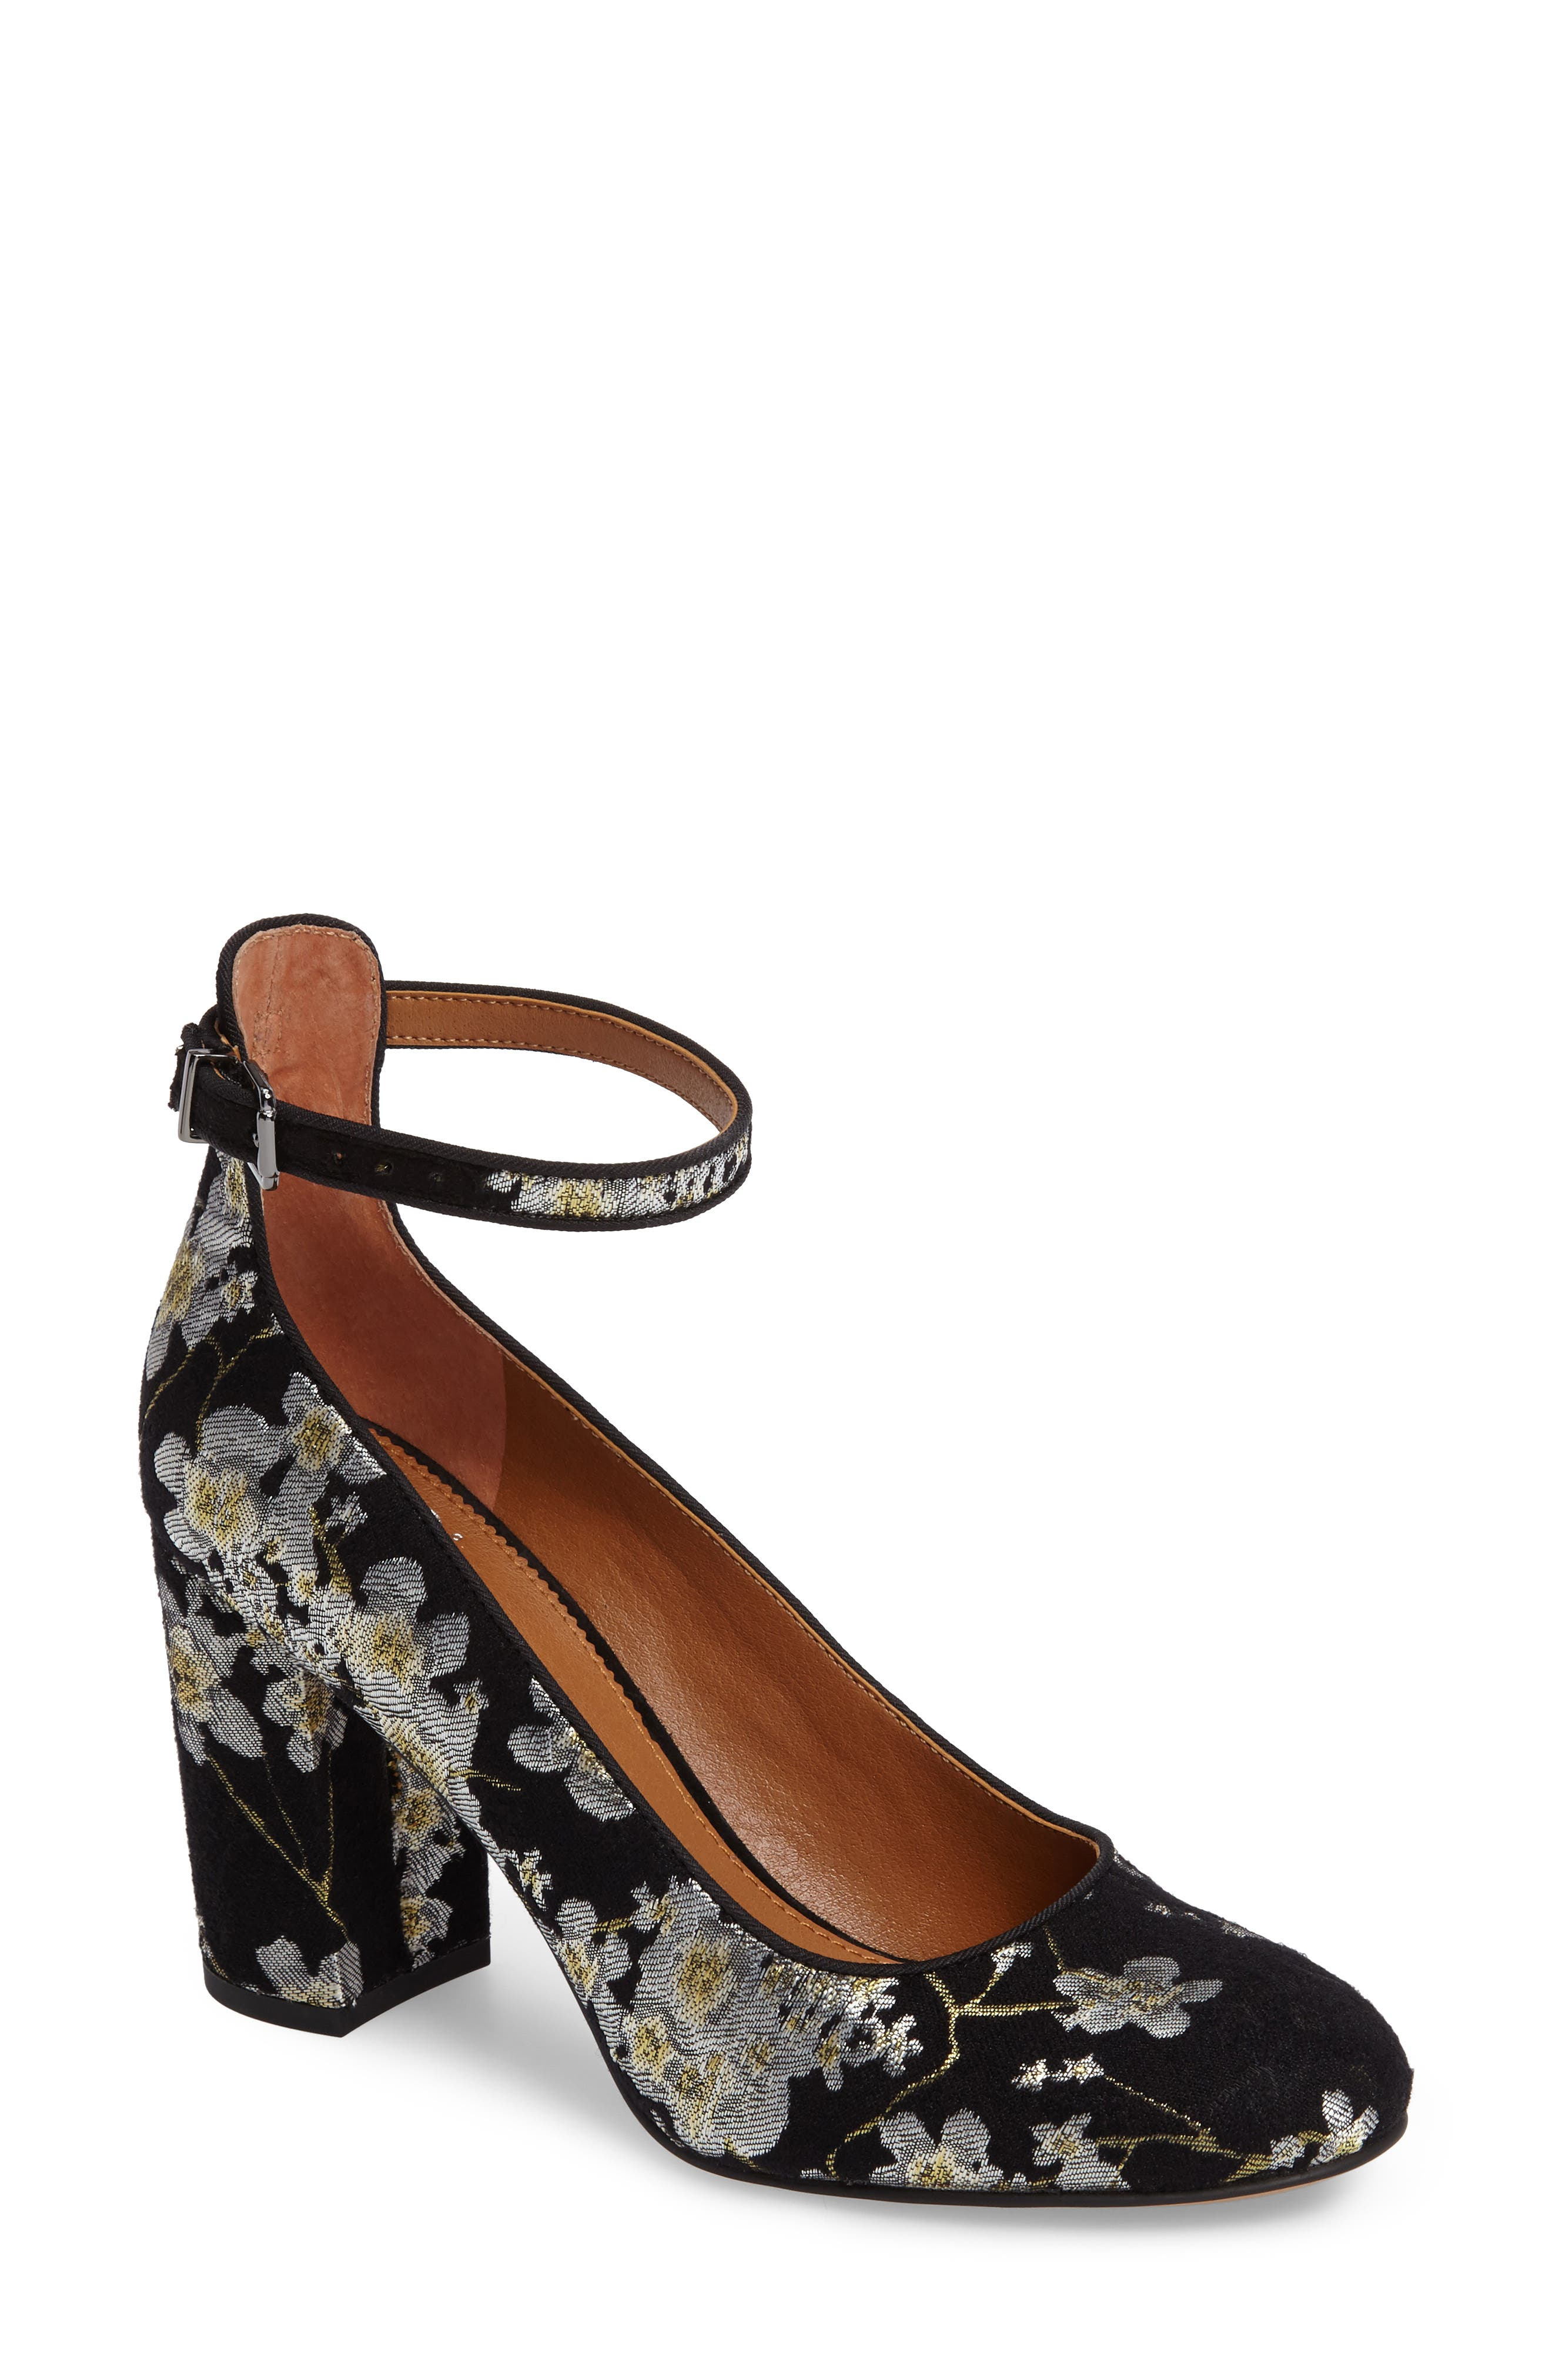 Alternate Image 1 Selected - SARTO by Franco Sarto Abbington Ankle Strap Pump (Women)